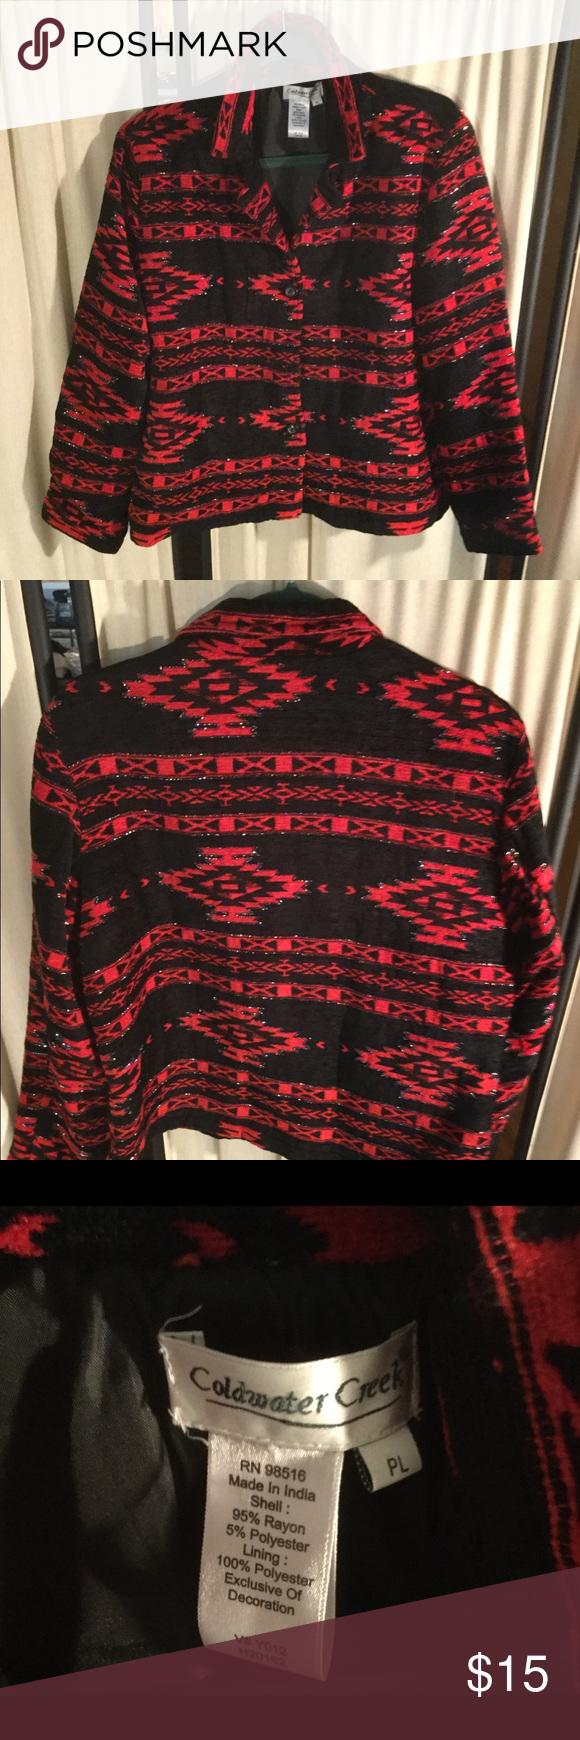 Vintage Coldwater Creek Red Tapestry Jacket